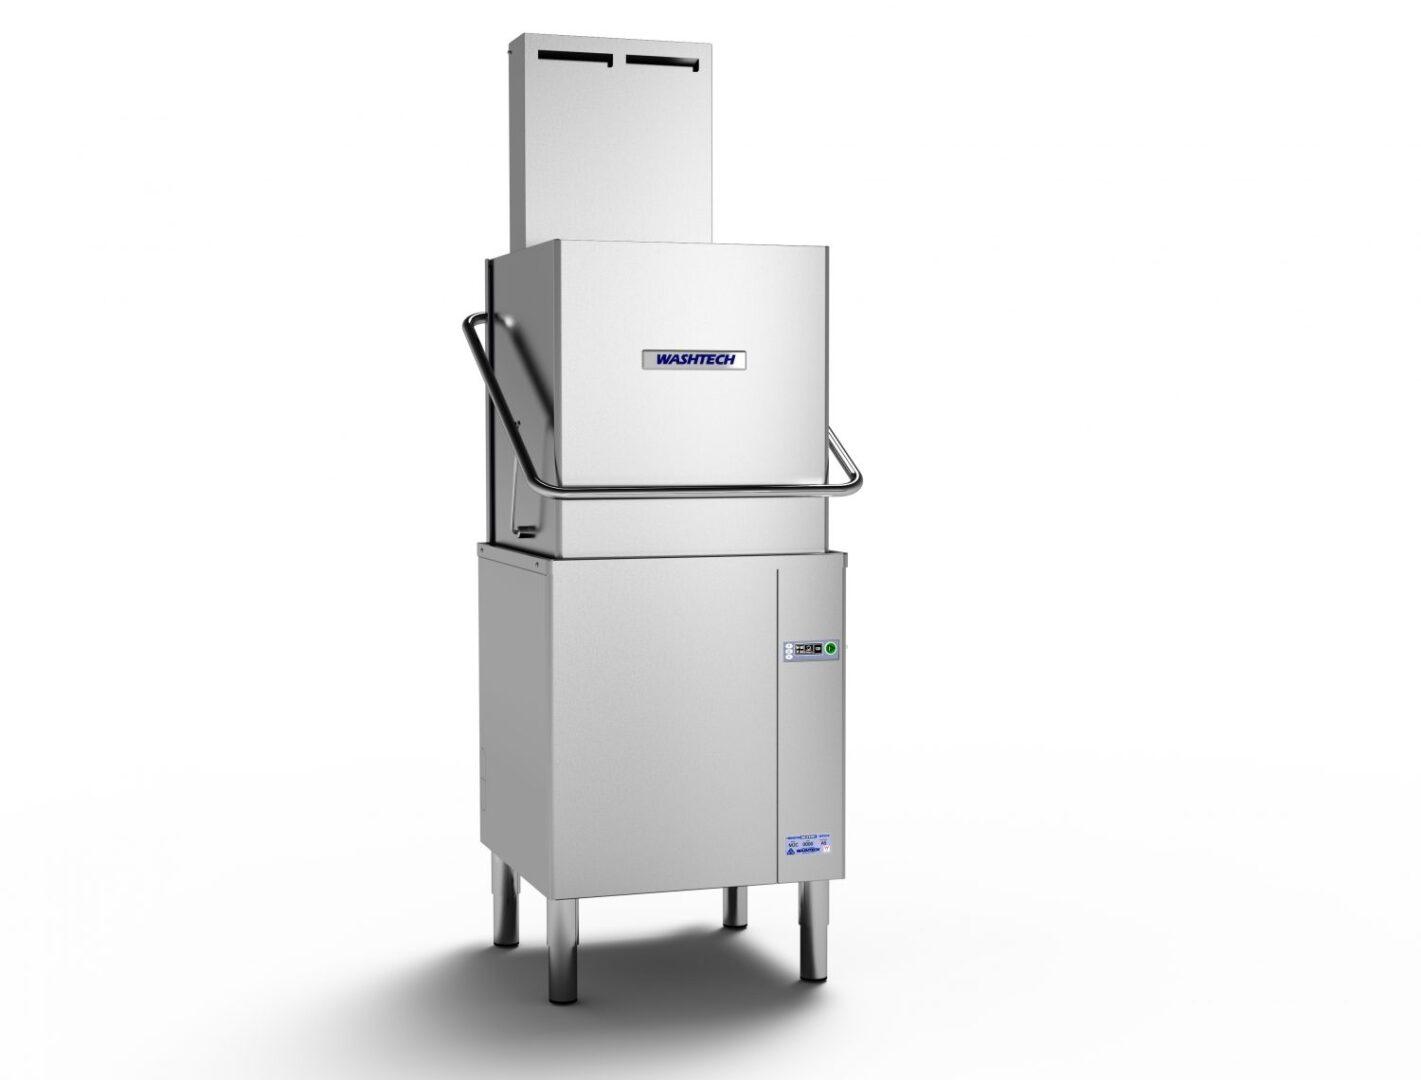 Washtech M2C – Professional Passthrough Dishwasher with Heat Condensing Unit – 500mm Rack